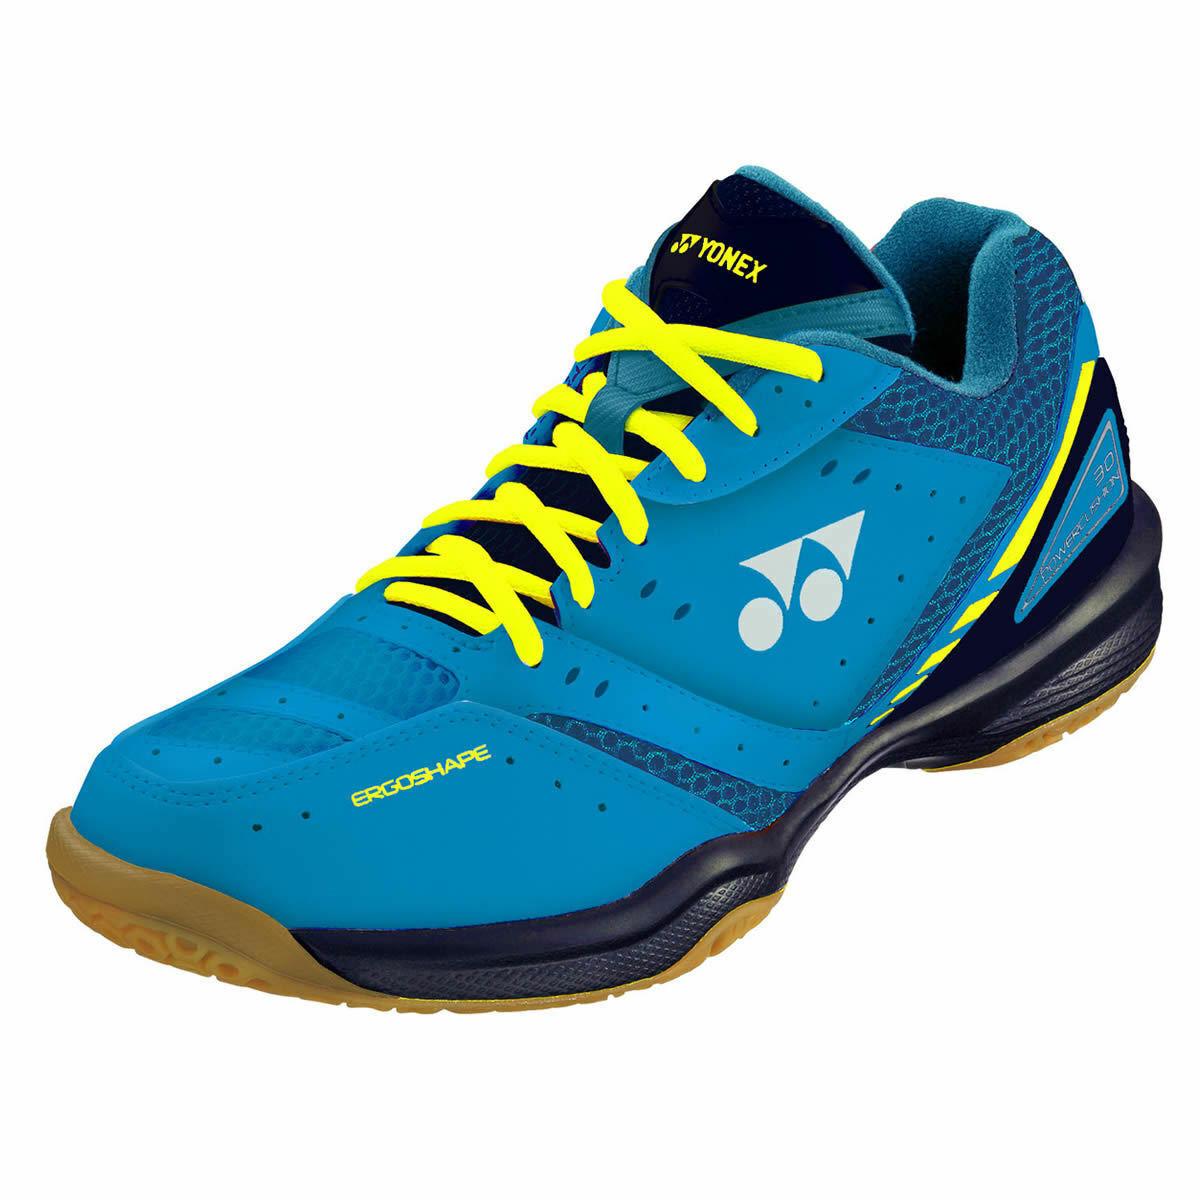 YONEX Badminton Schuh SHB 30 Unisex NEU - Gr. 43 43 43 dc0ff7